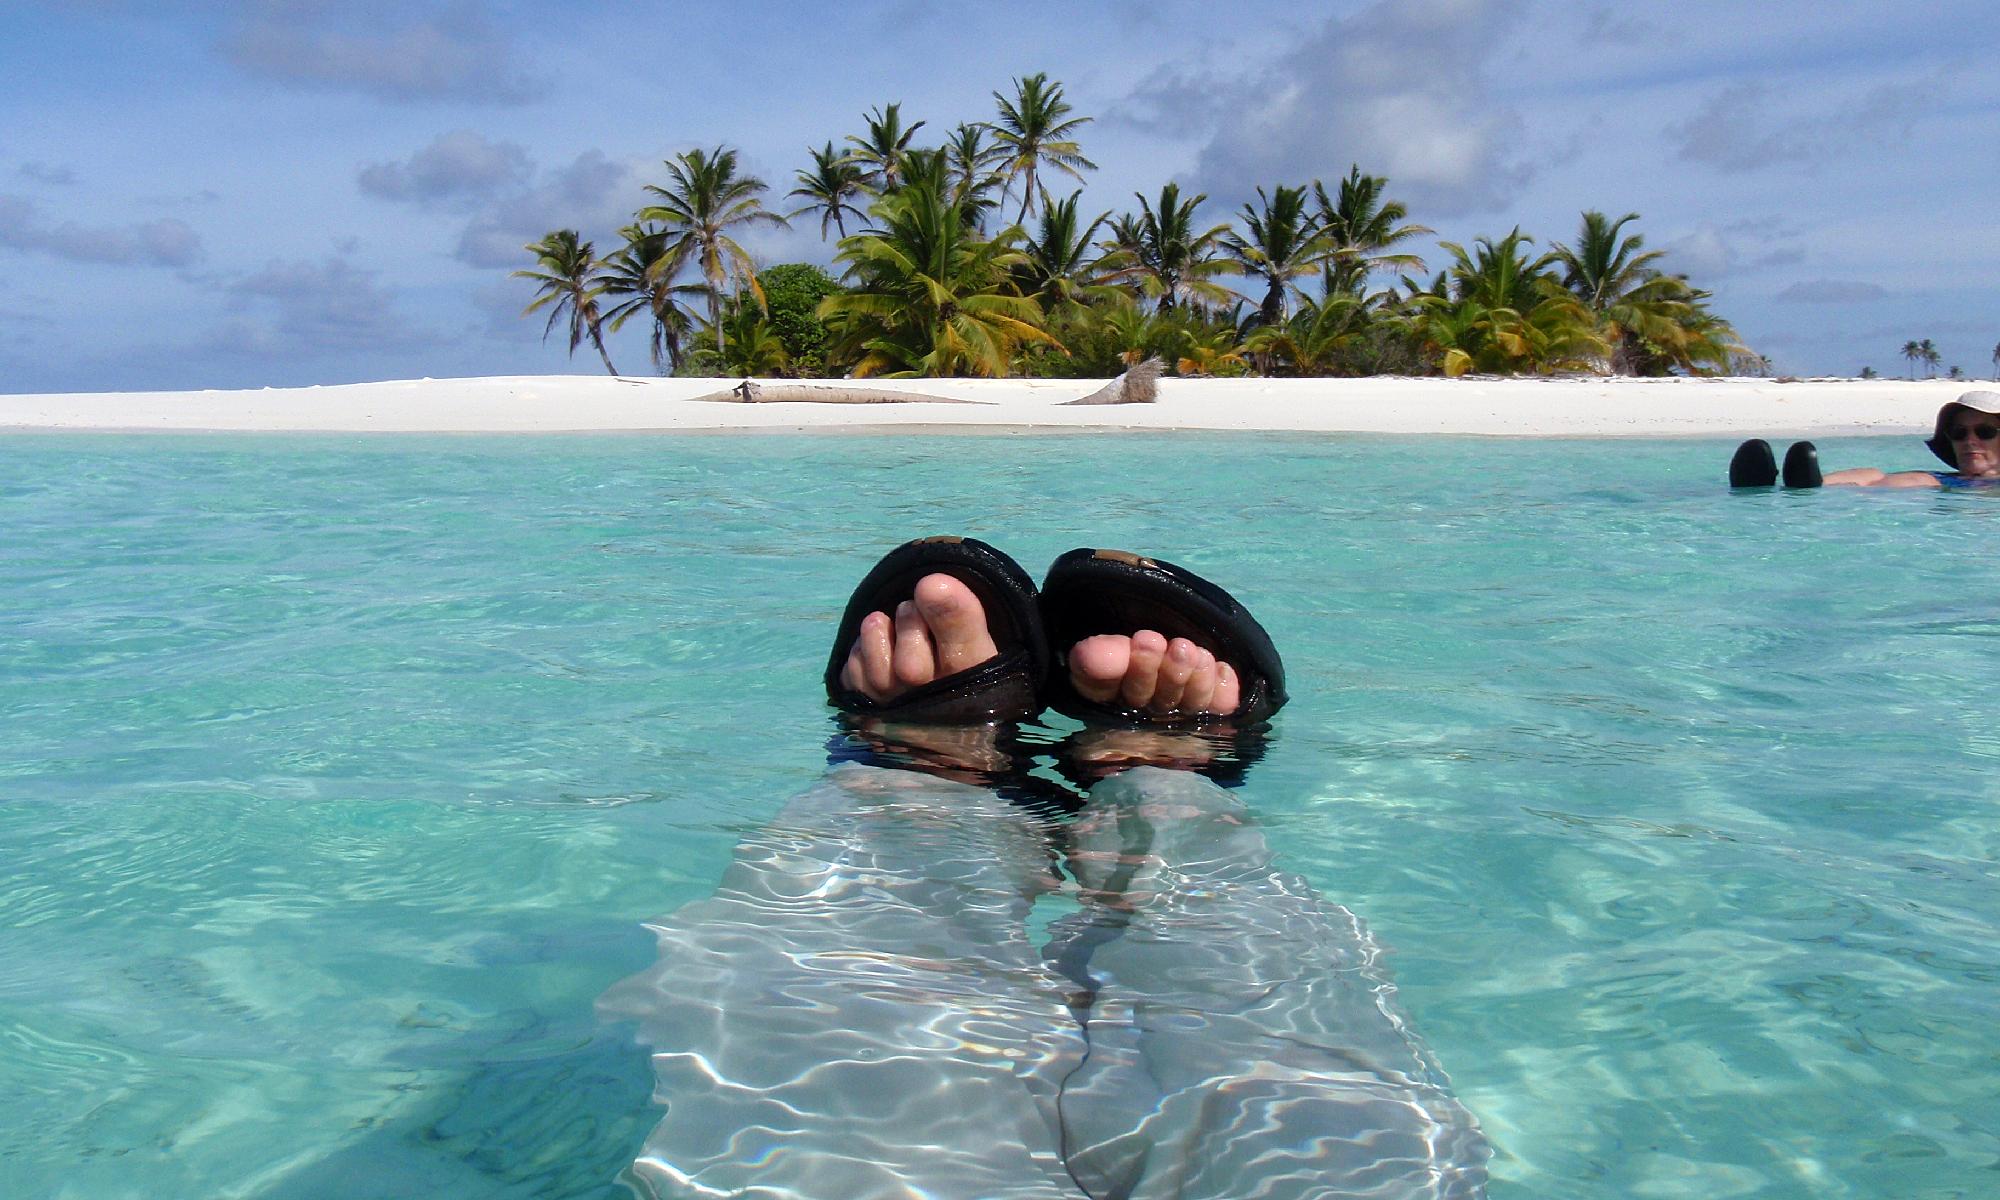 Adrift in the Indian Ocean